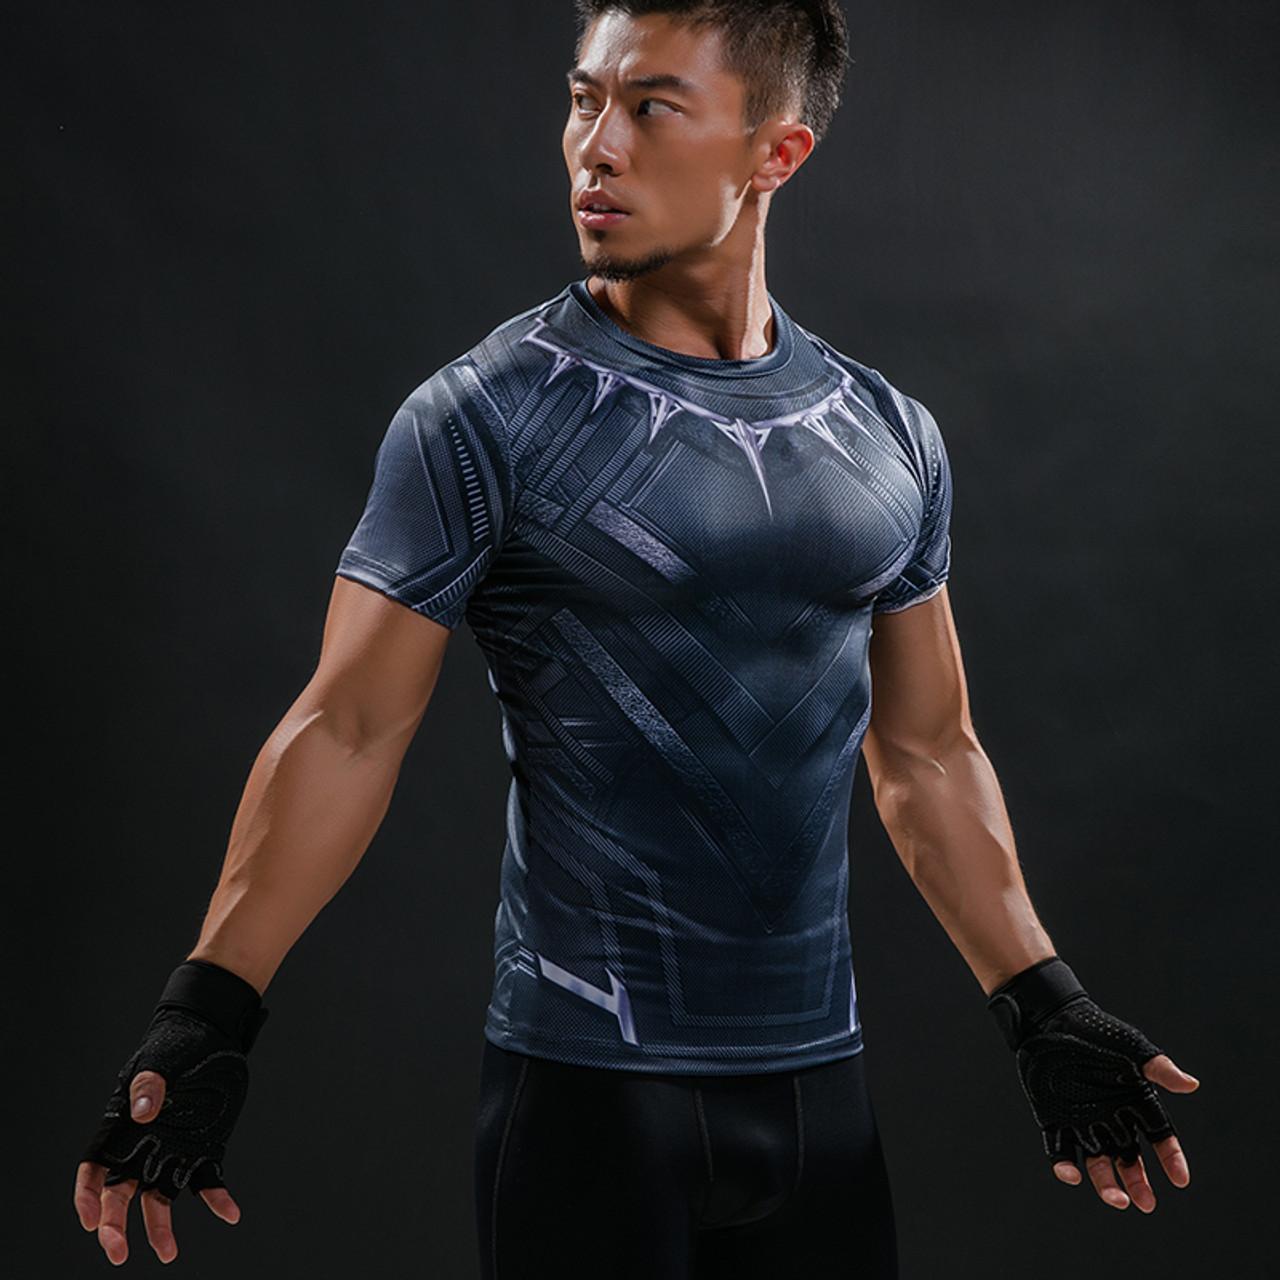 b61ad7663d7c ... Black Panther 3D Printed T-Shirt Men Compression Fashion Men T Shirt  Marvel Avengers Cosplay ...